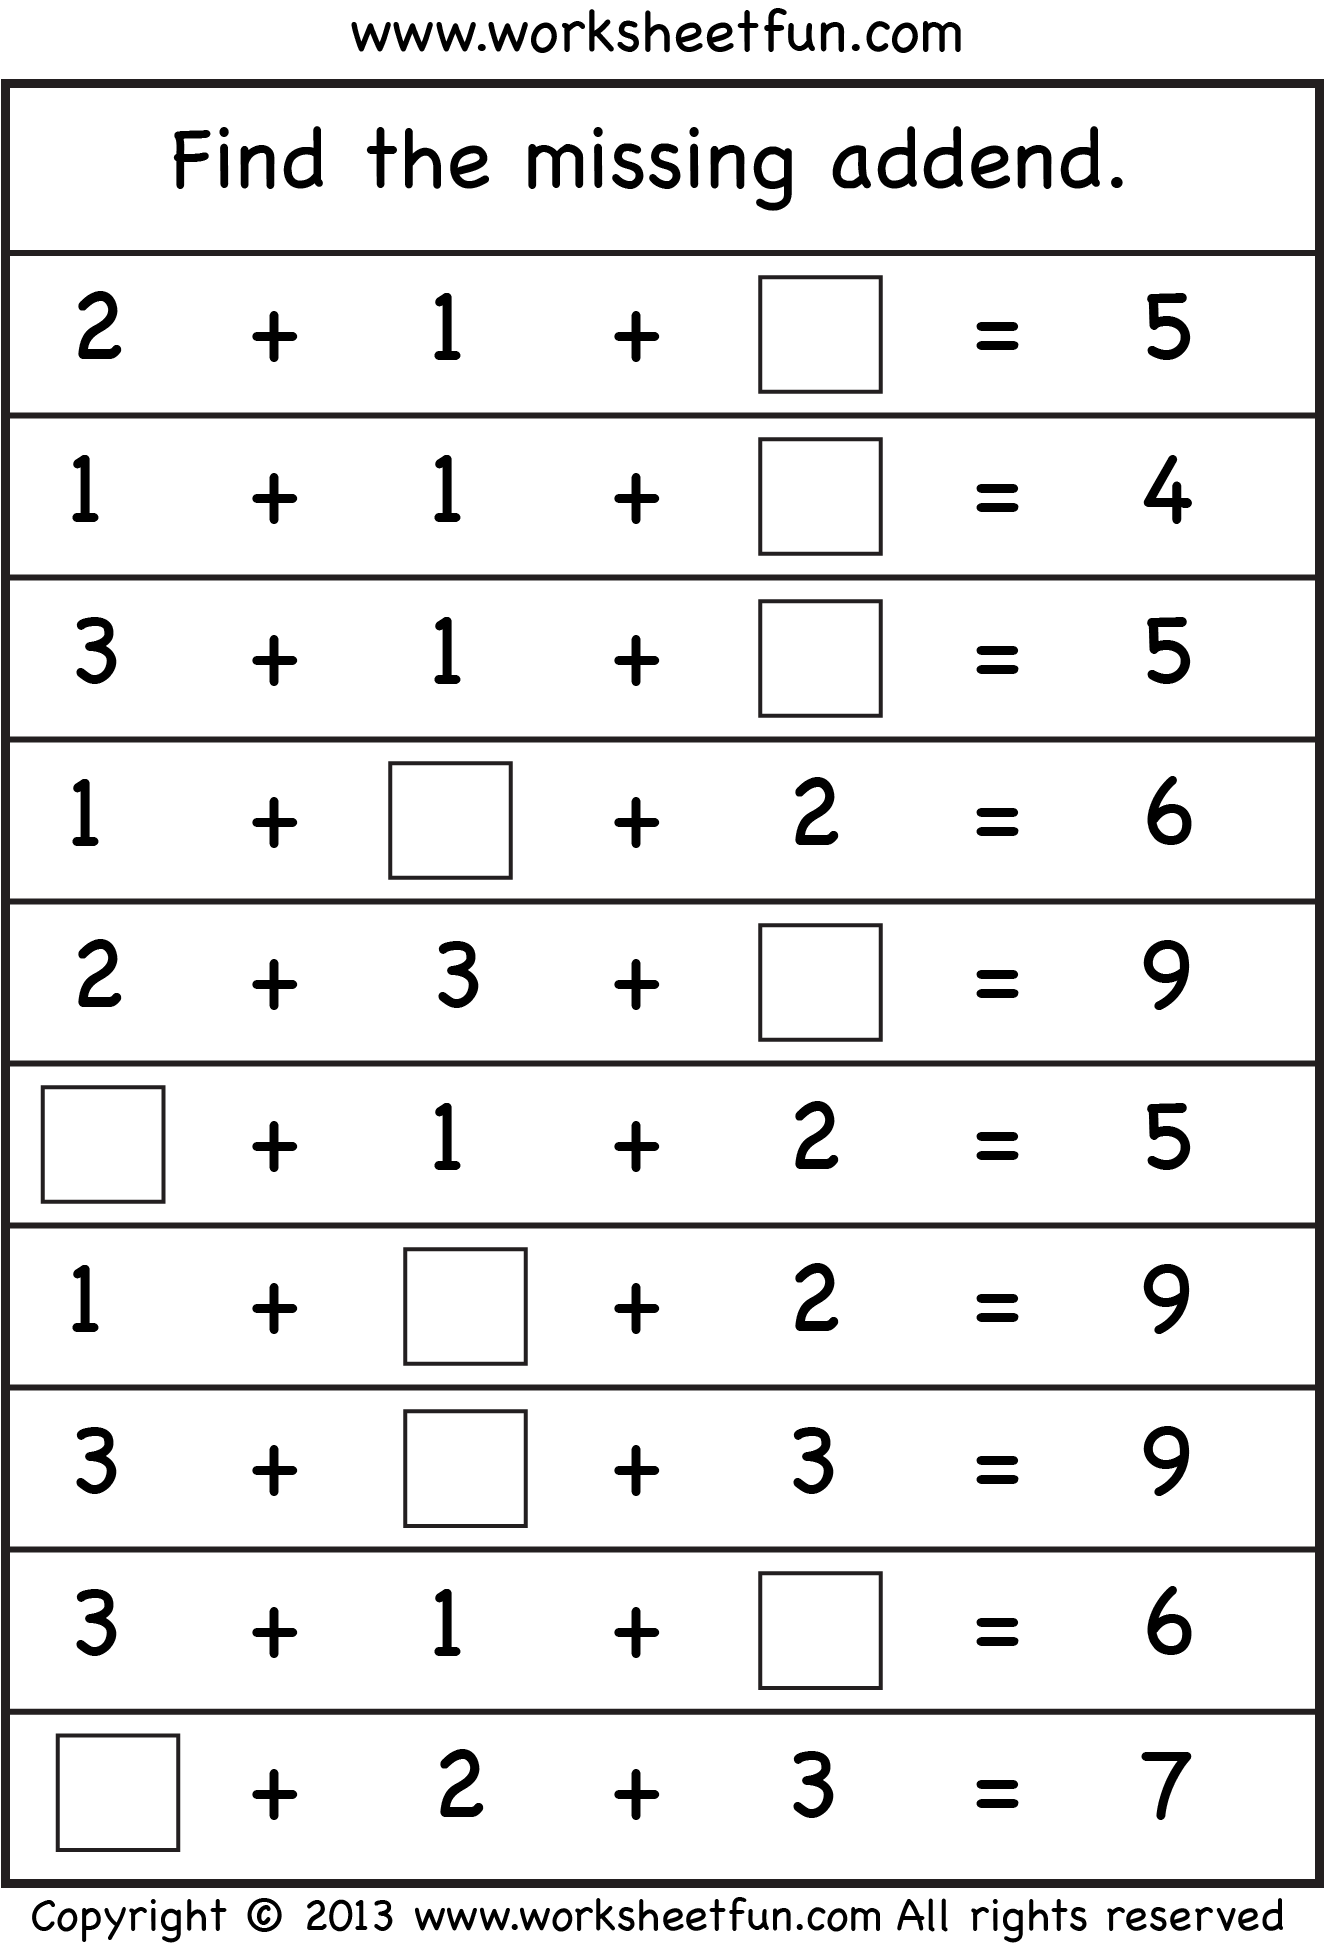 Missing Addend Worksheets To Free Download Missing Addend Worksheets 1st Grade Fr Mental Maths Worksheets First Grade Math Worksheets First Grade Worksheets